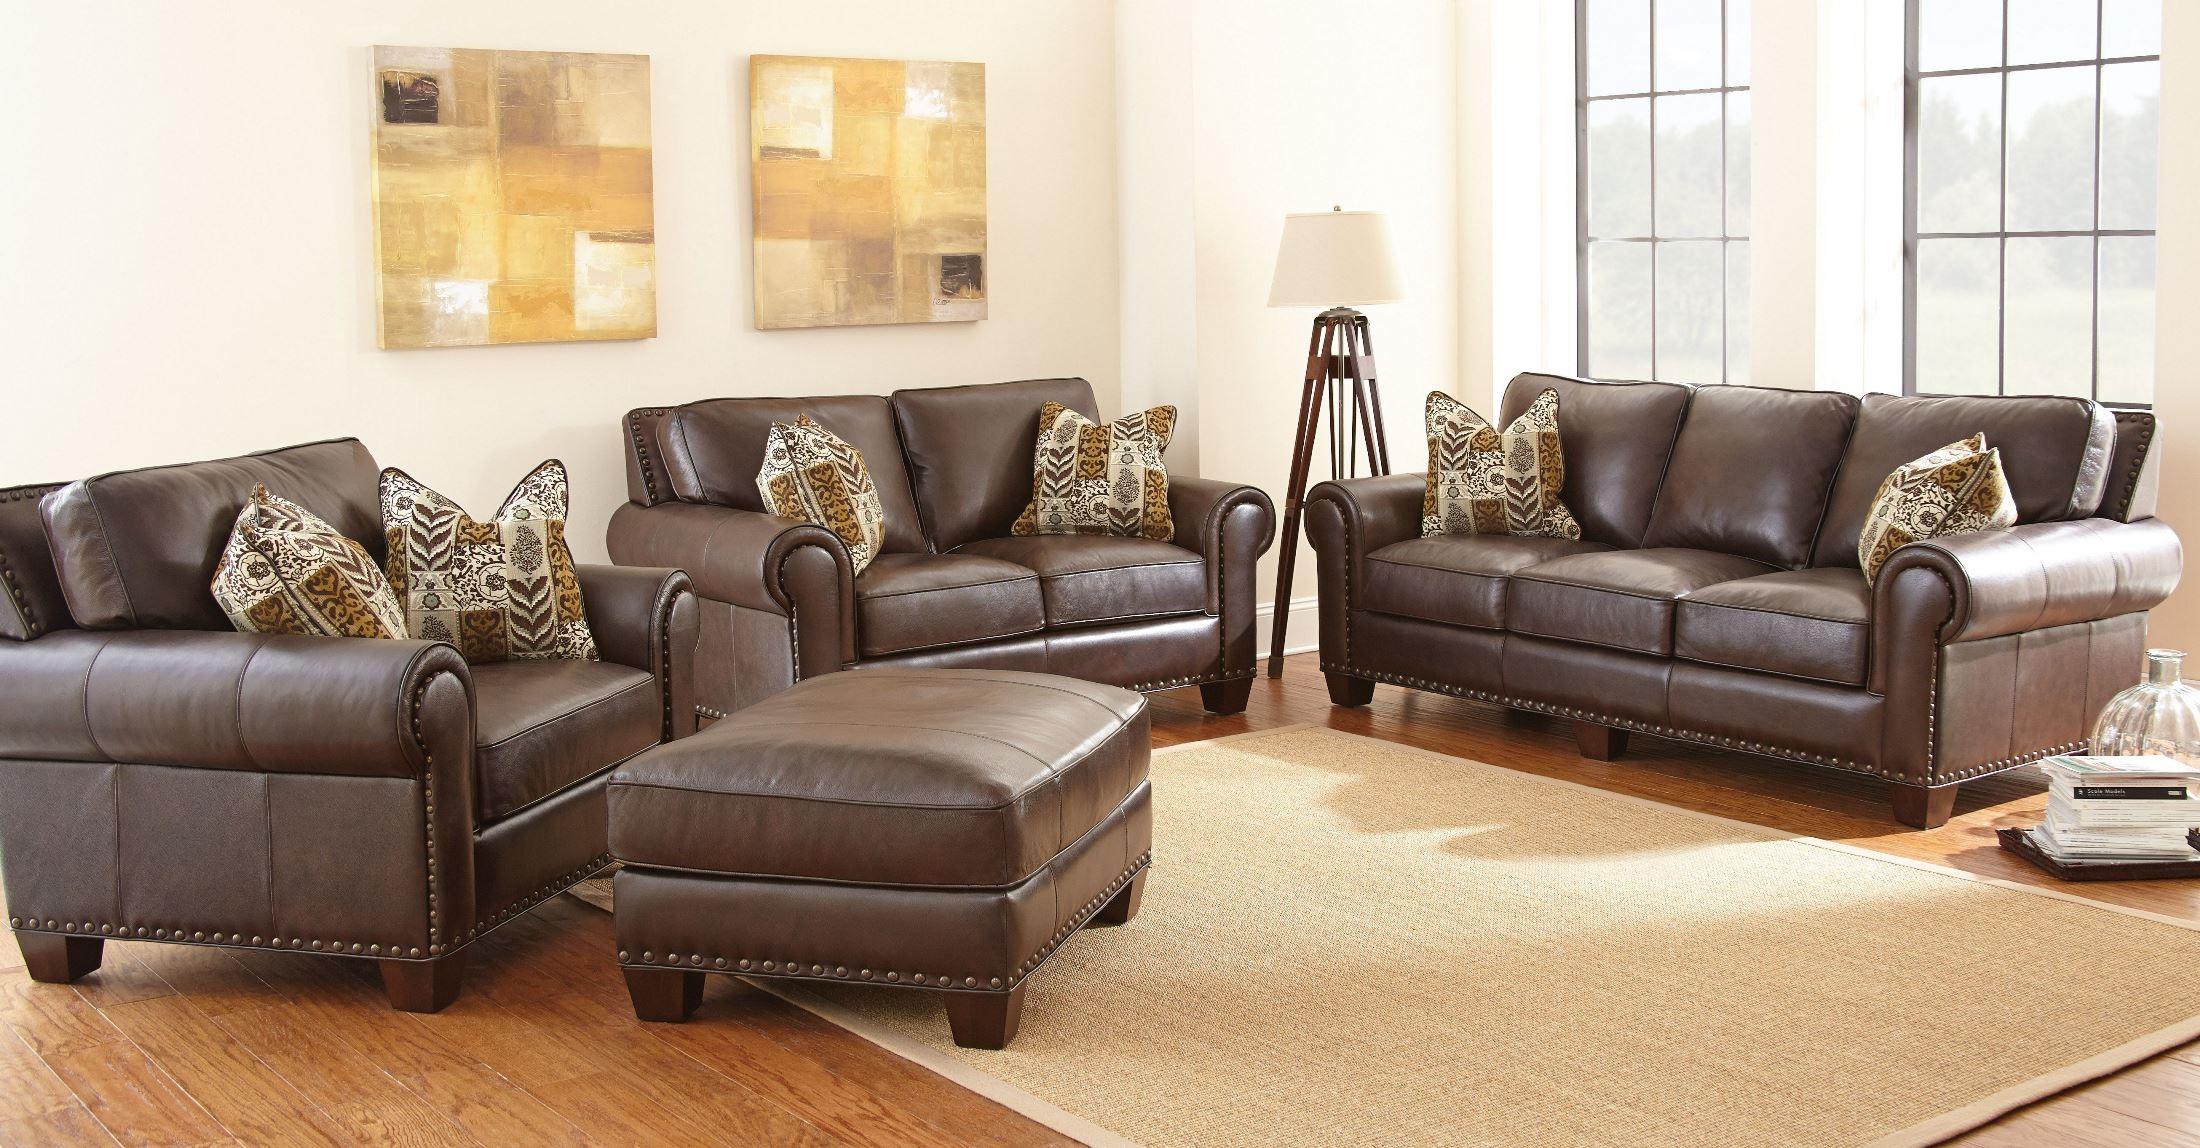 Escher Top Grain Leather Sofa With 2 Accent Pillows